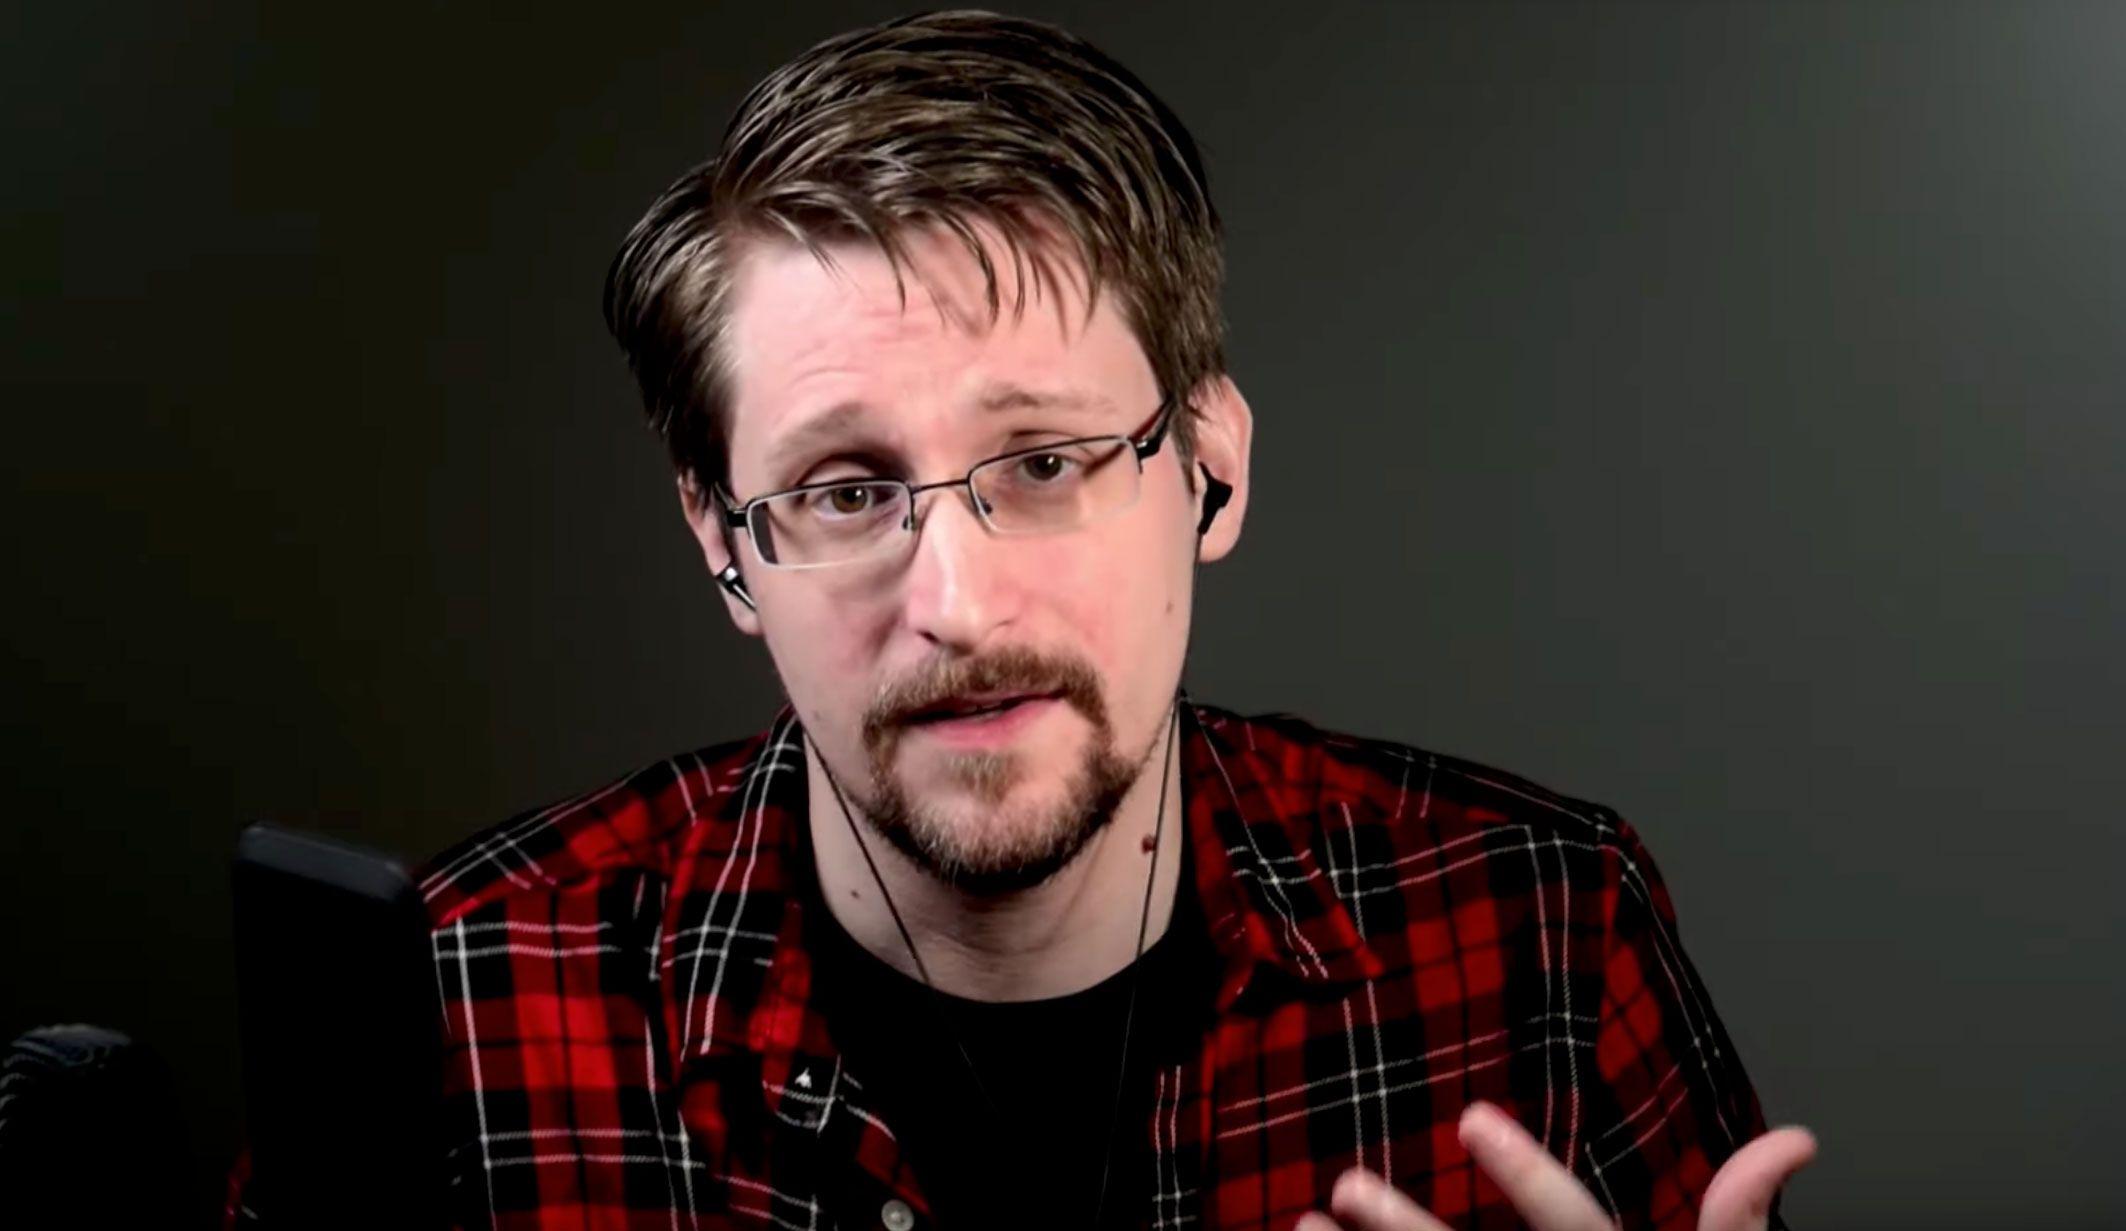 Resultado de imagem para Edward Snowden